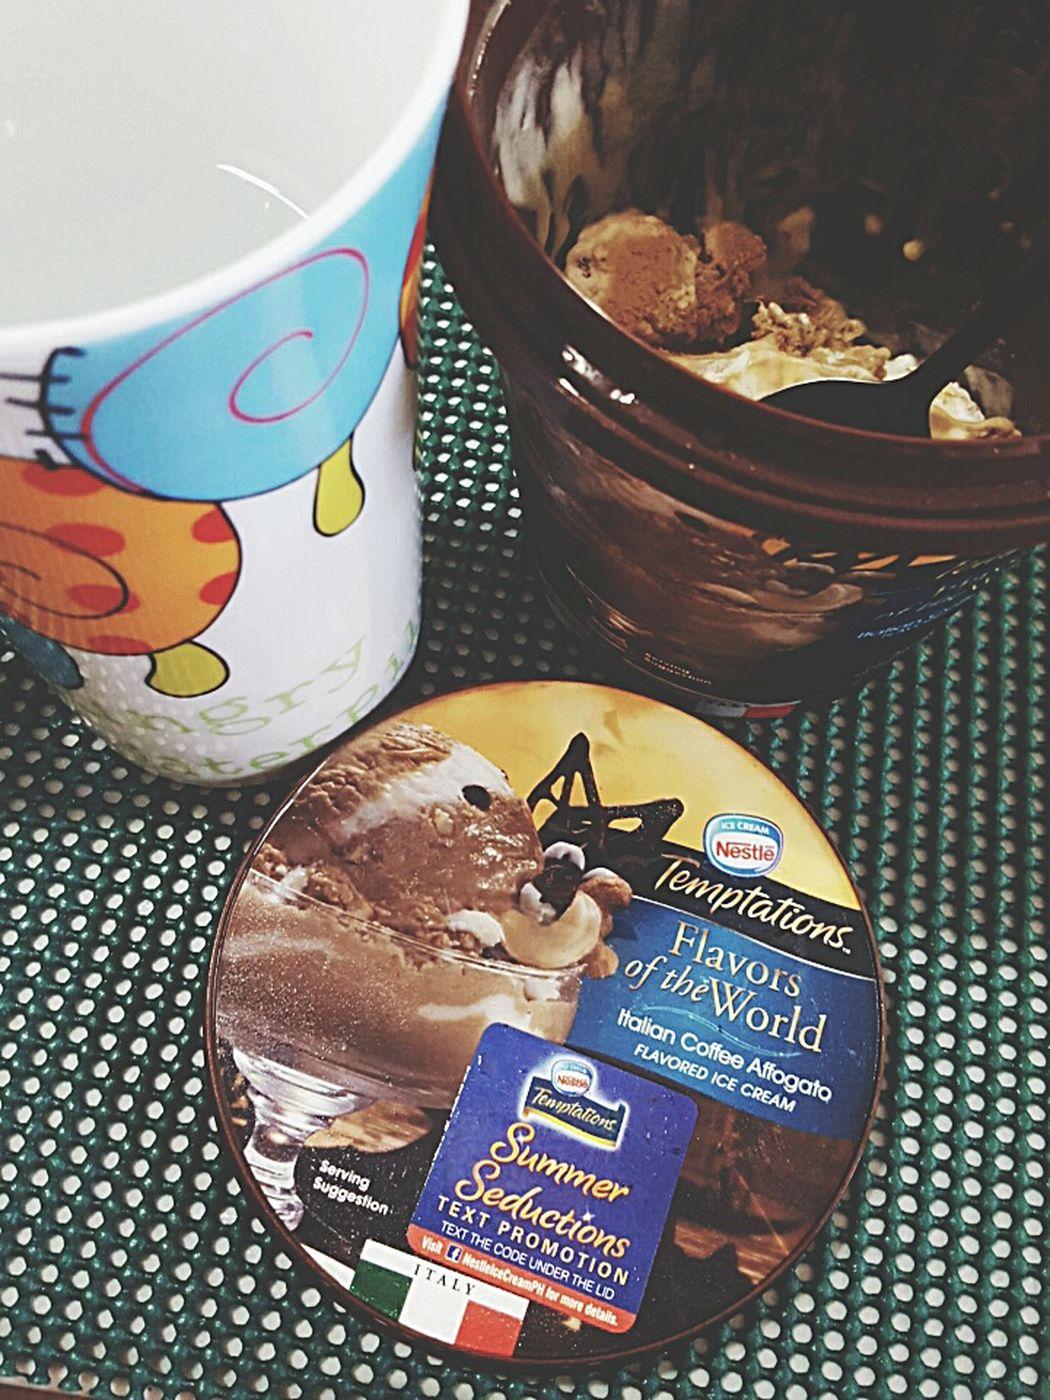 Verdict 5☆ Good for coffee lovers!:) Beattheheat Dessert Porn Time For Dessert! Italiancoffeeaffogato Getintomybellynow Yummy Dessert Dessertoftheday Somethingtotaste Enjoying Life